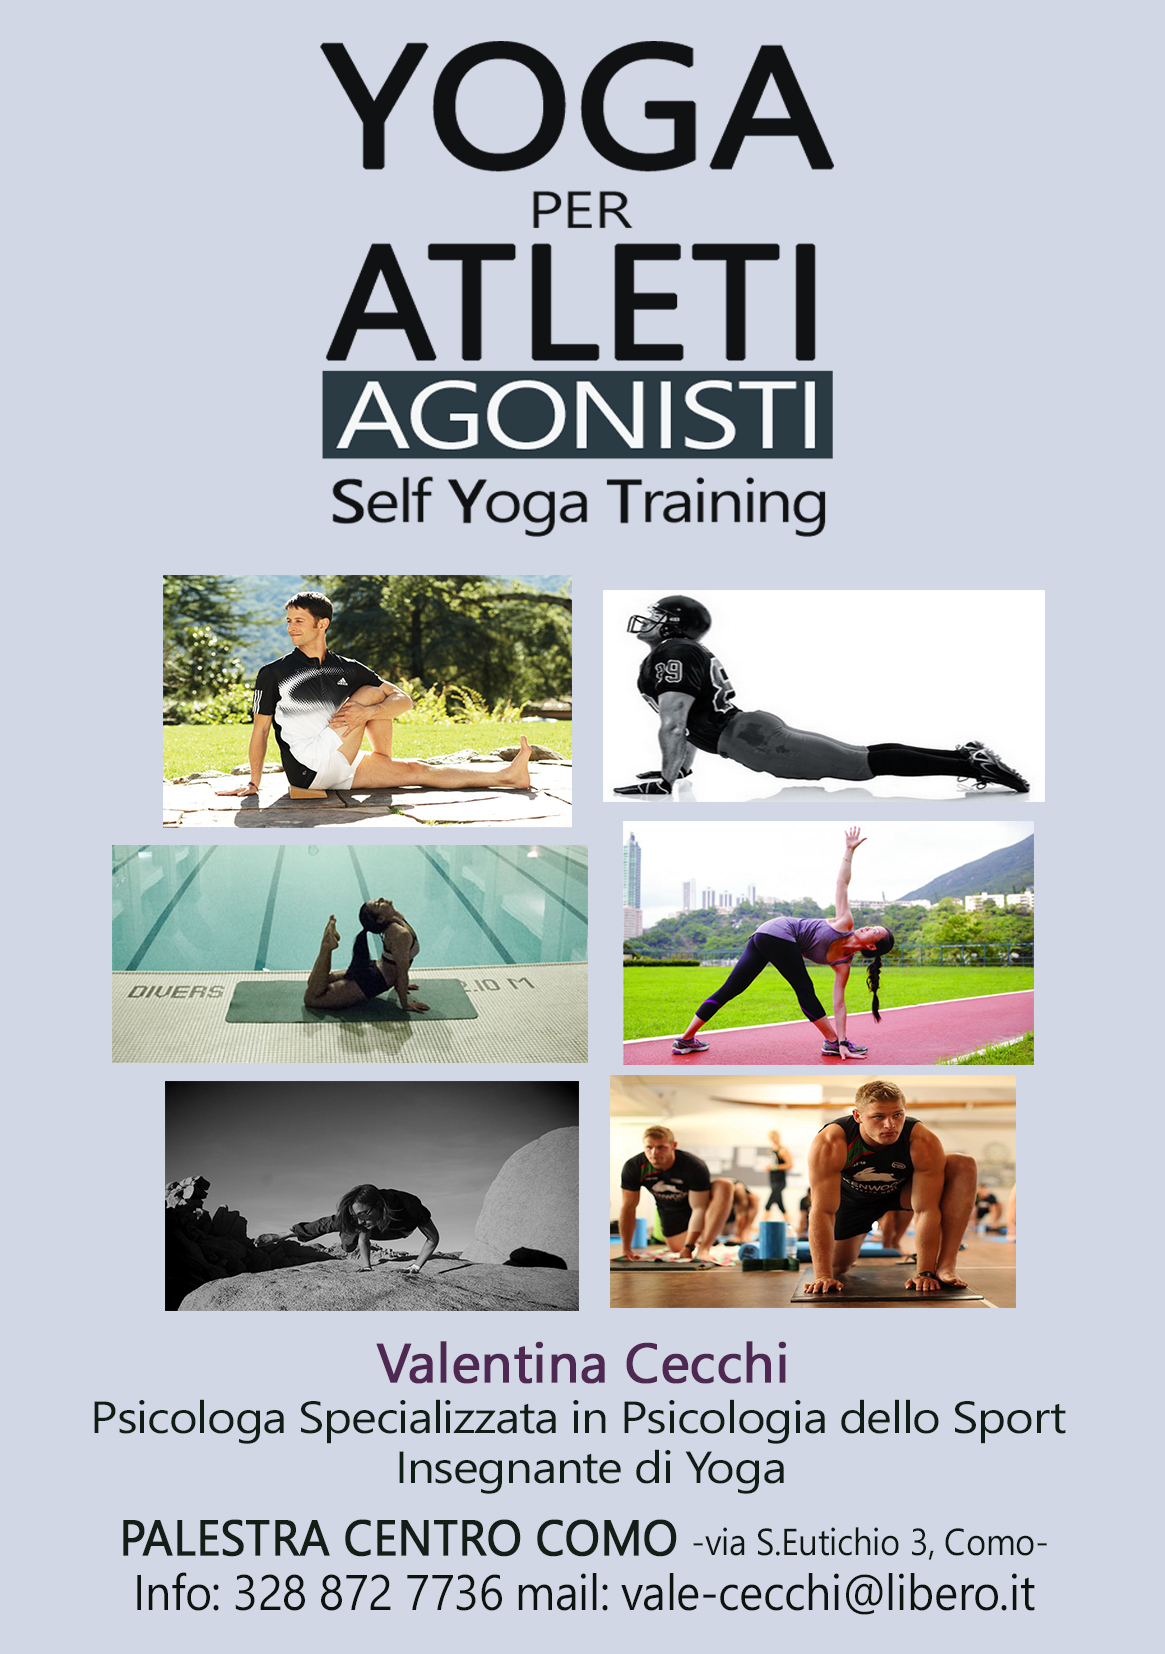 Volantino A5 Yoga Atleti -2